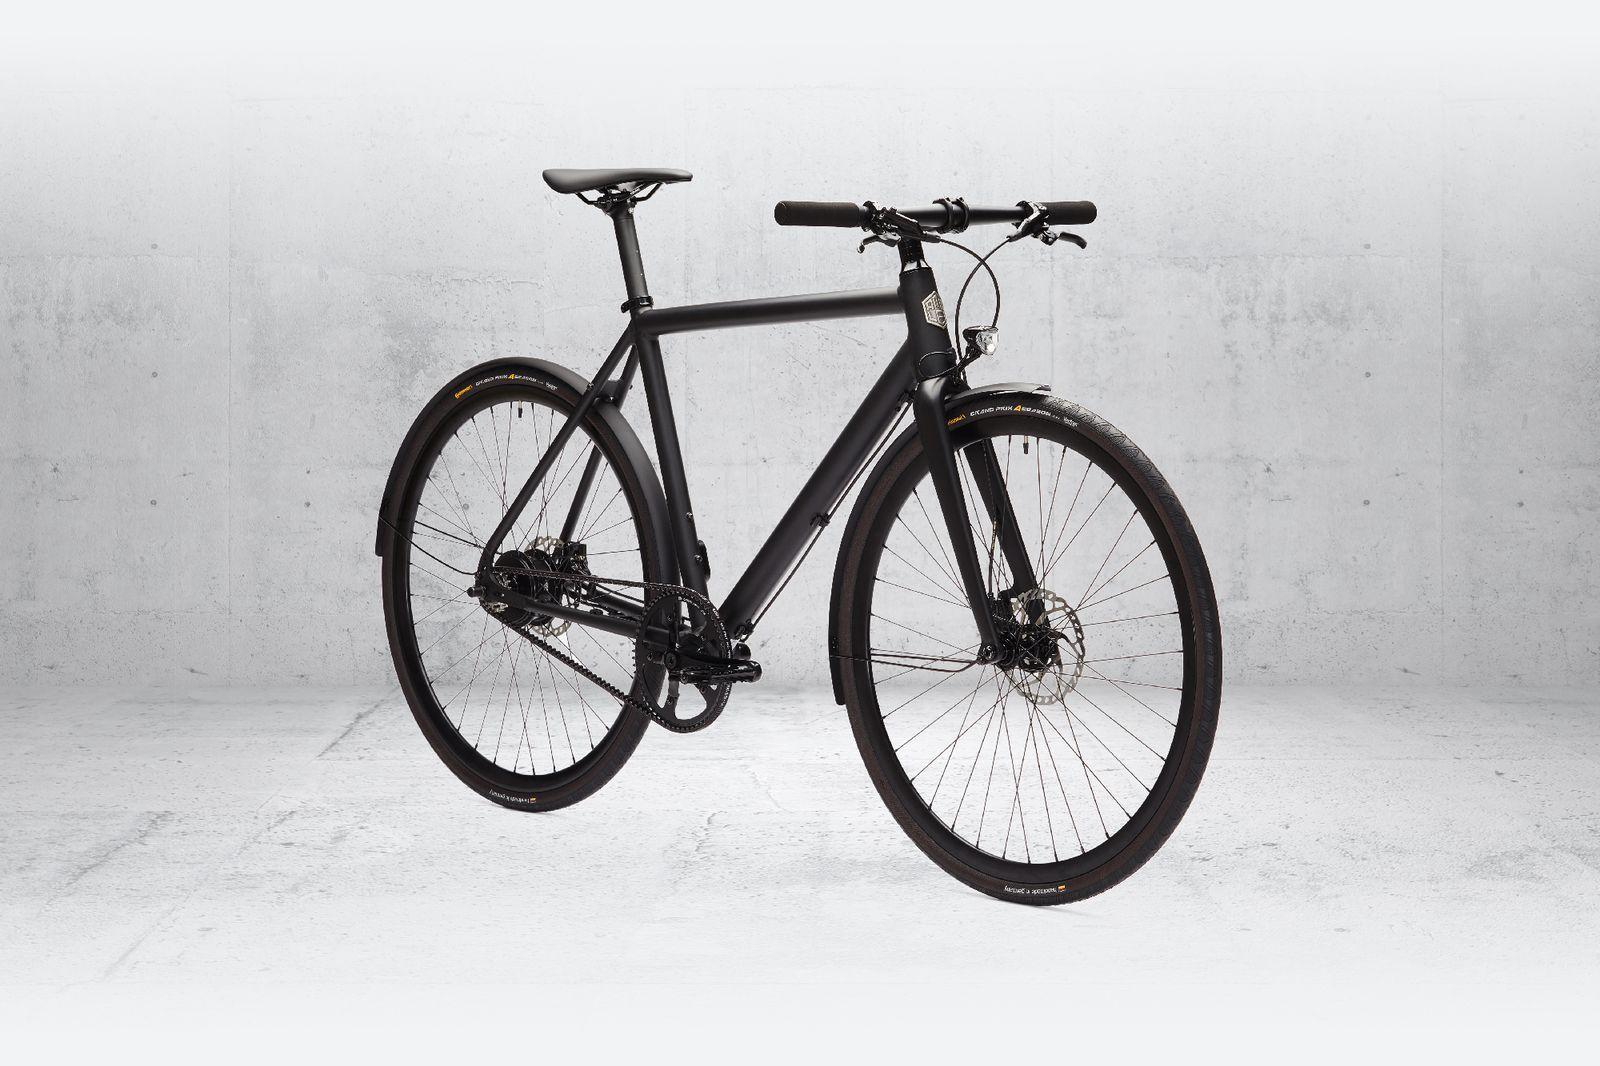 Ampler S 2019 E Bikes Look Promising Bike Commuter Bike Electric Bike Price